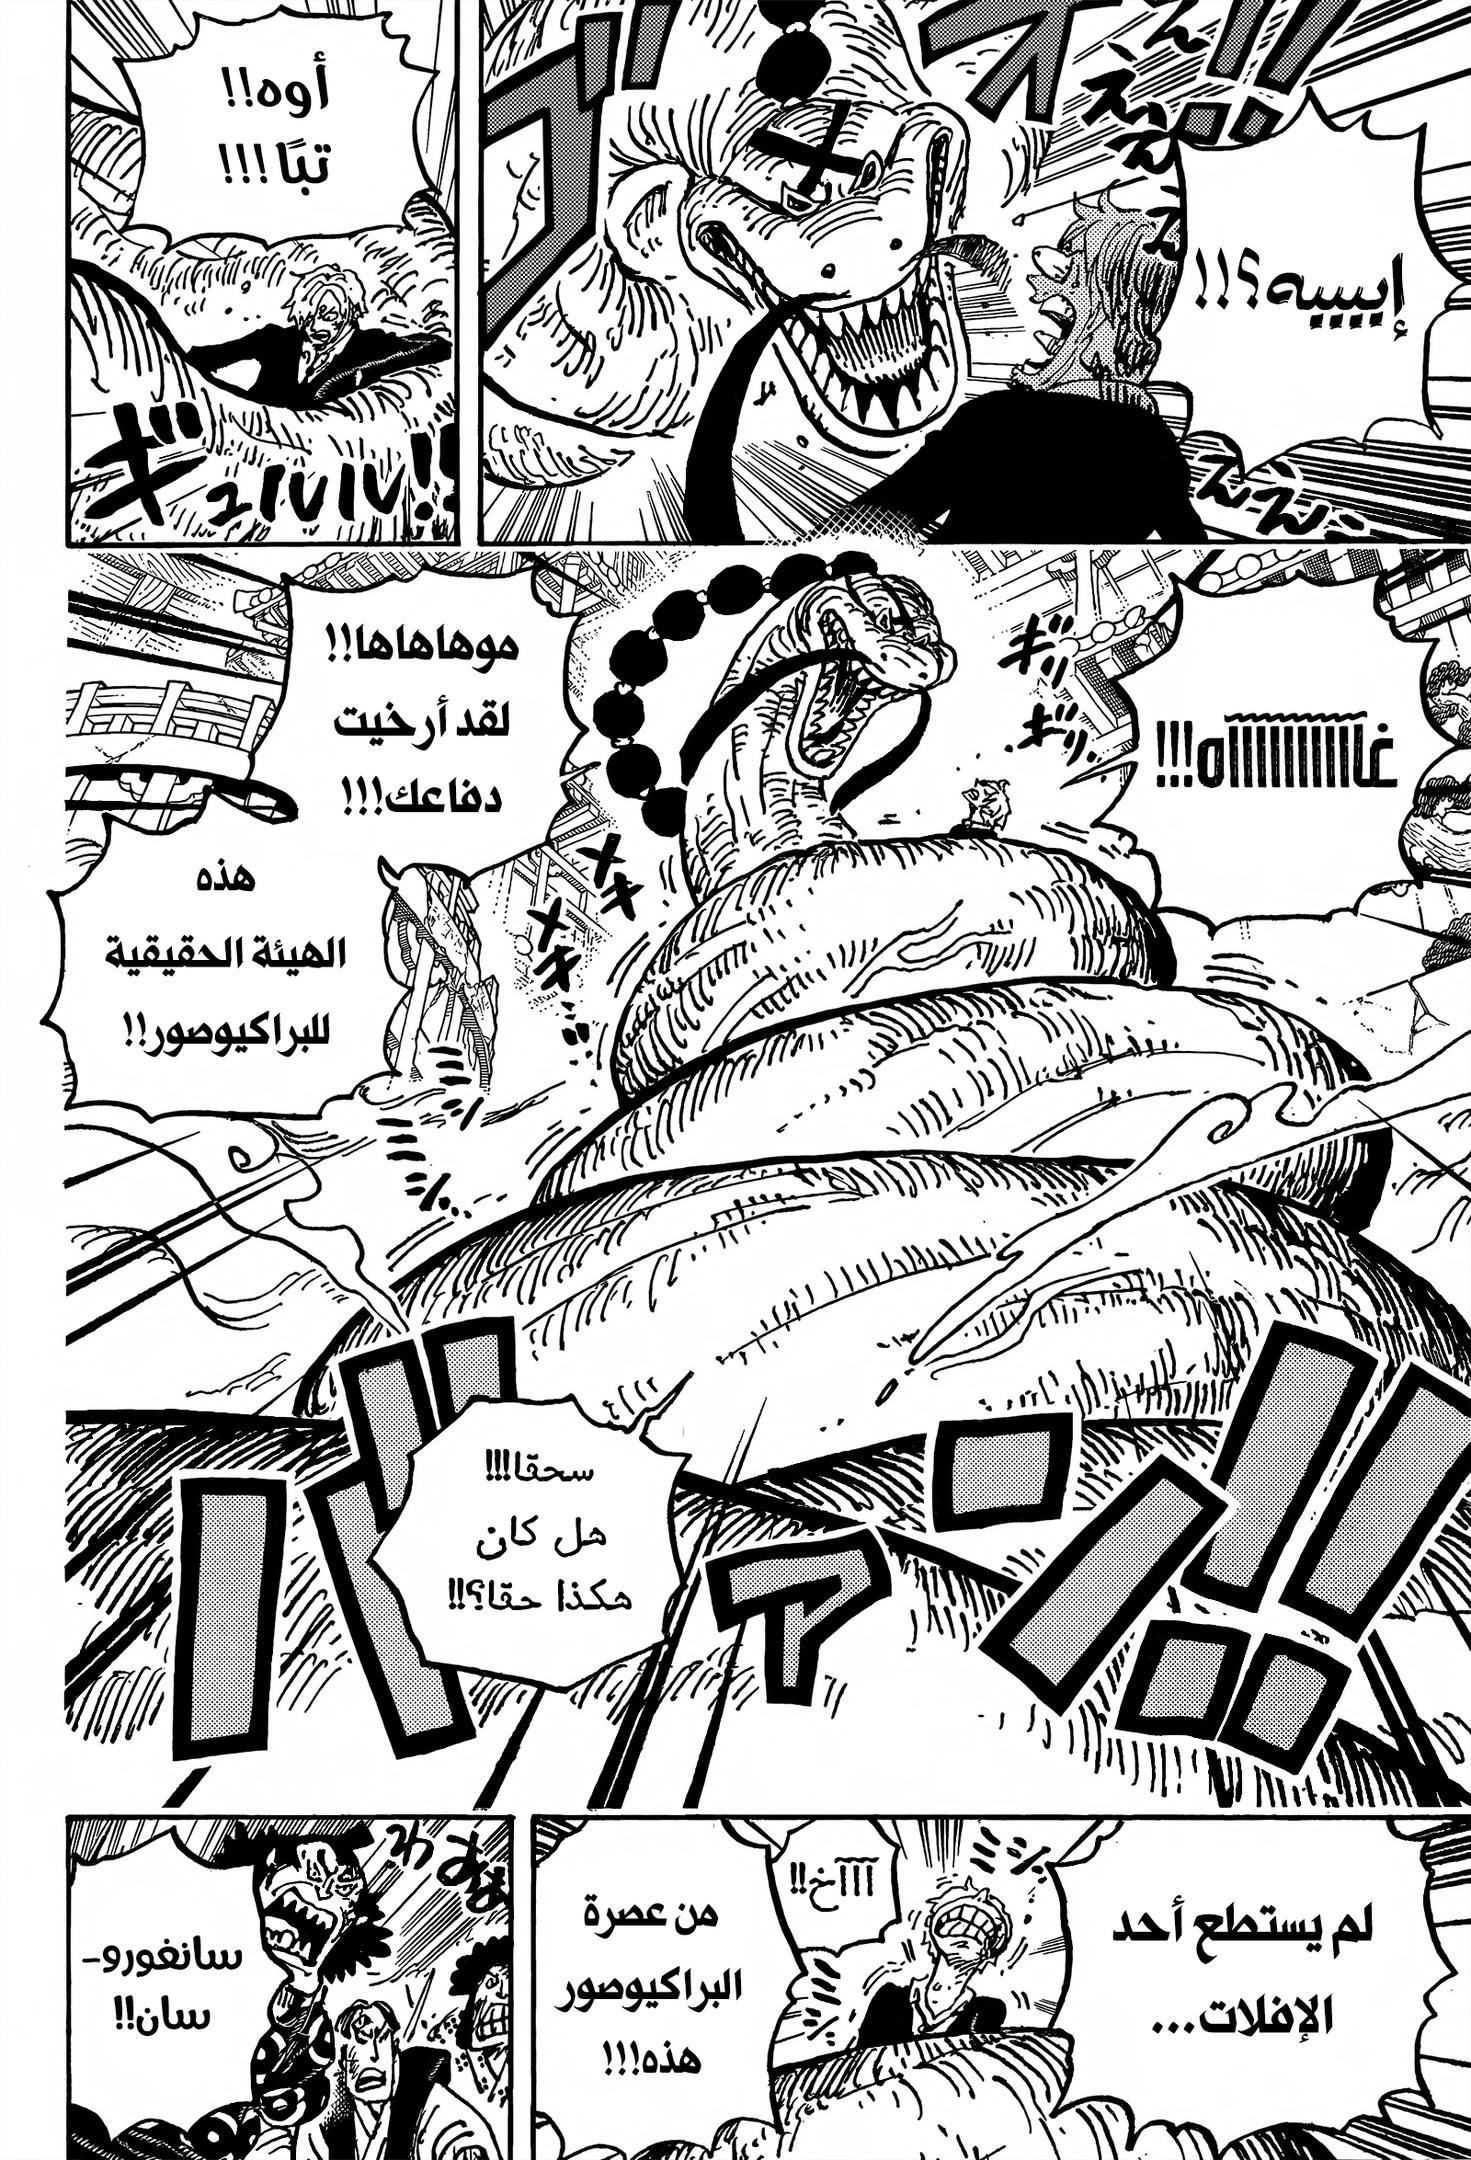 Arab One Piece 1028, image №14